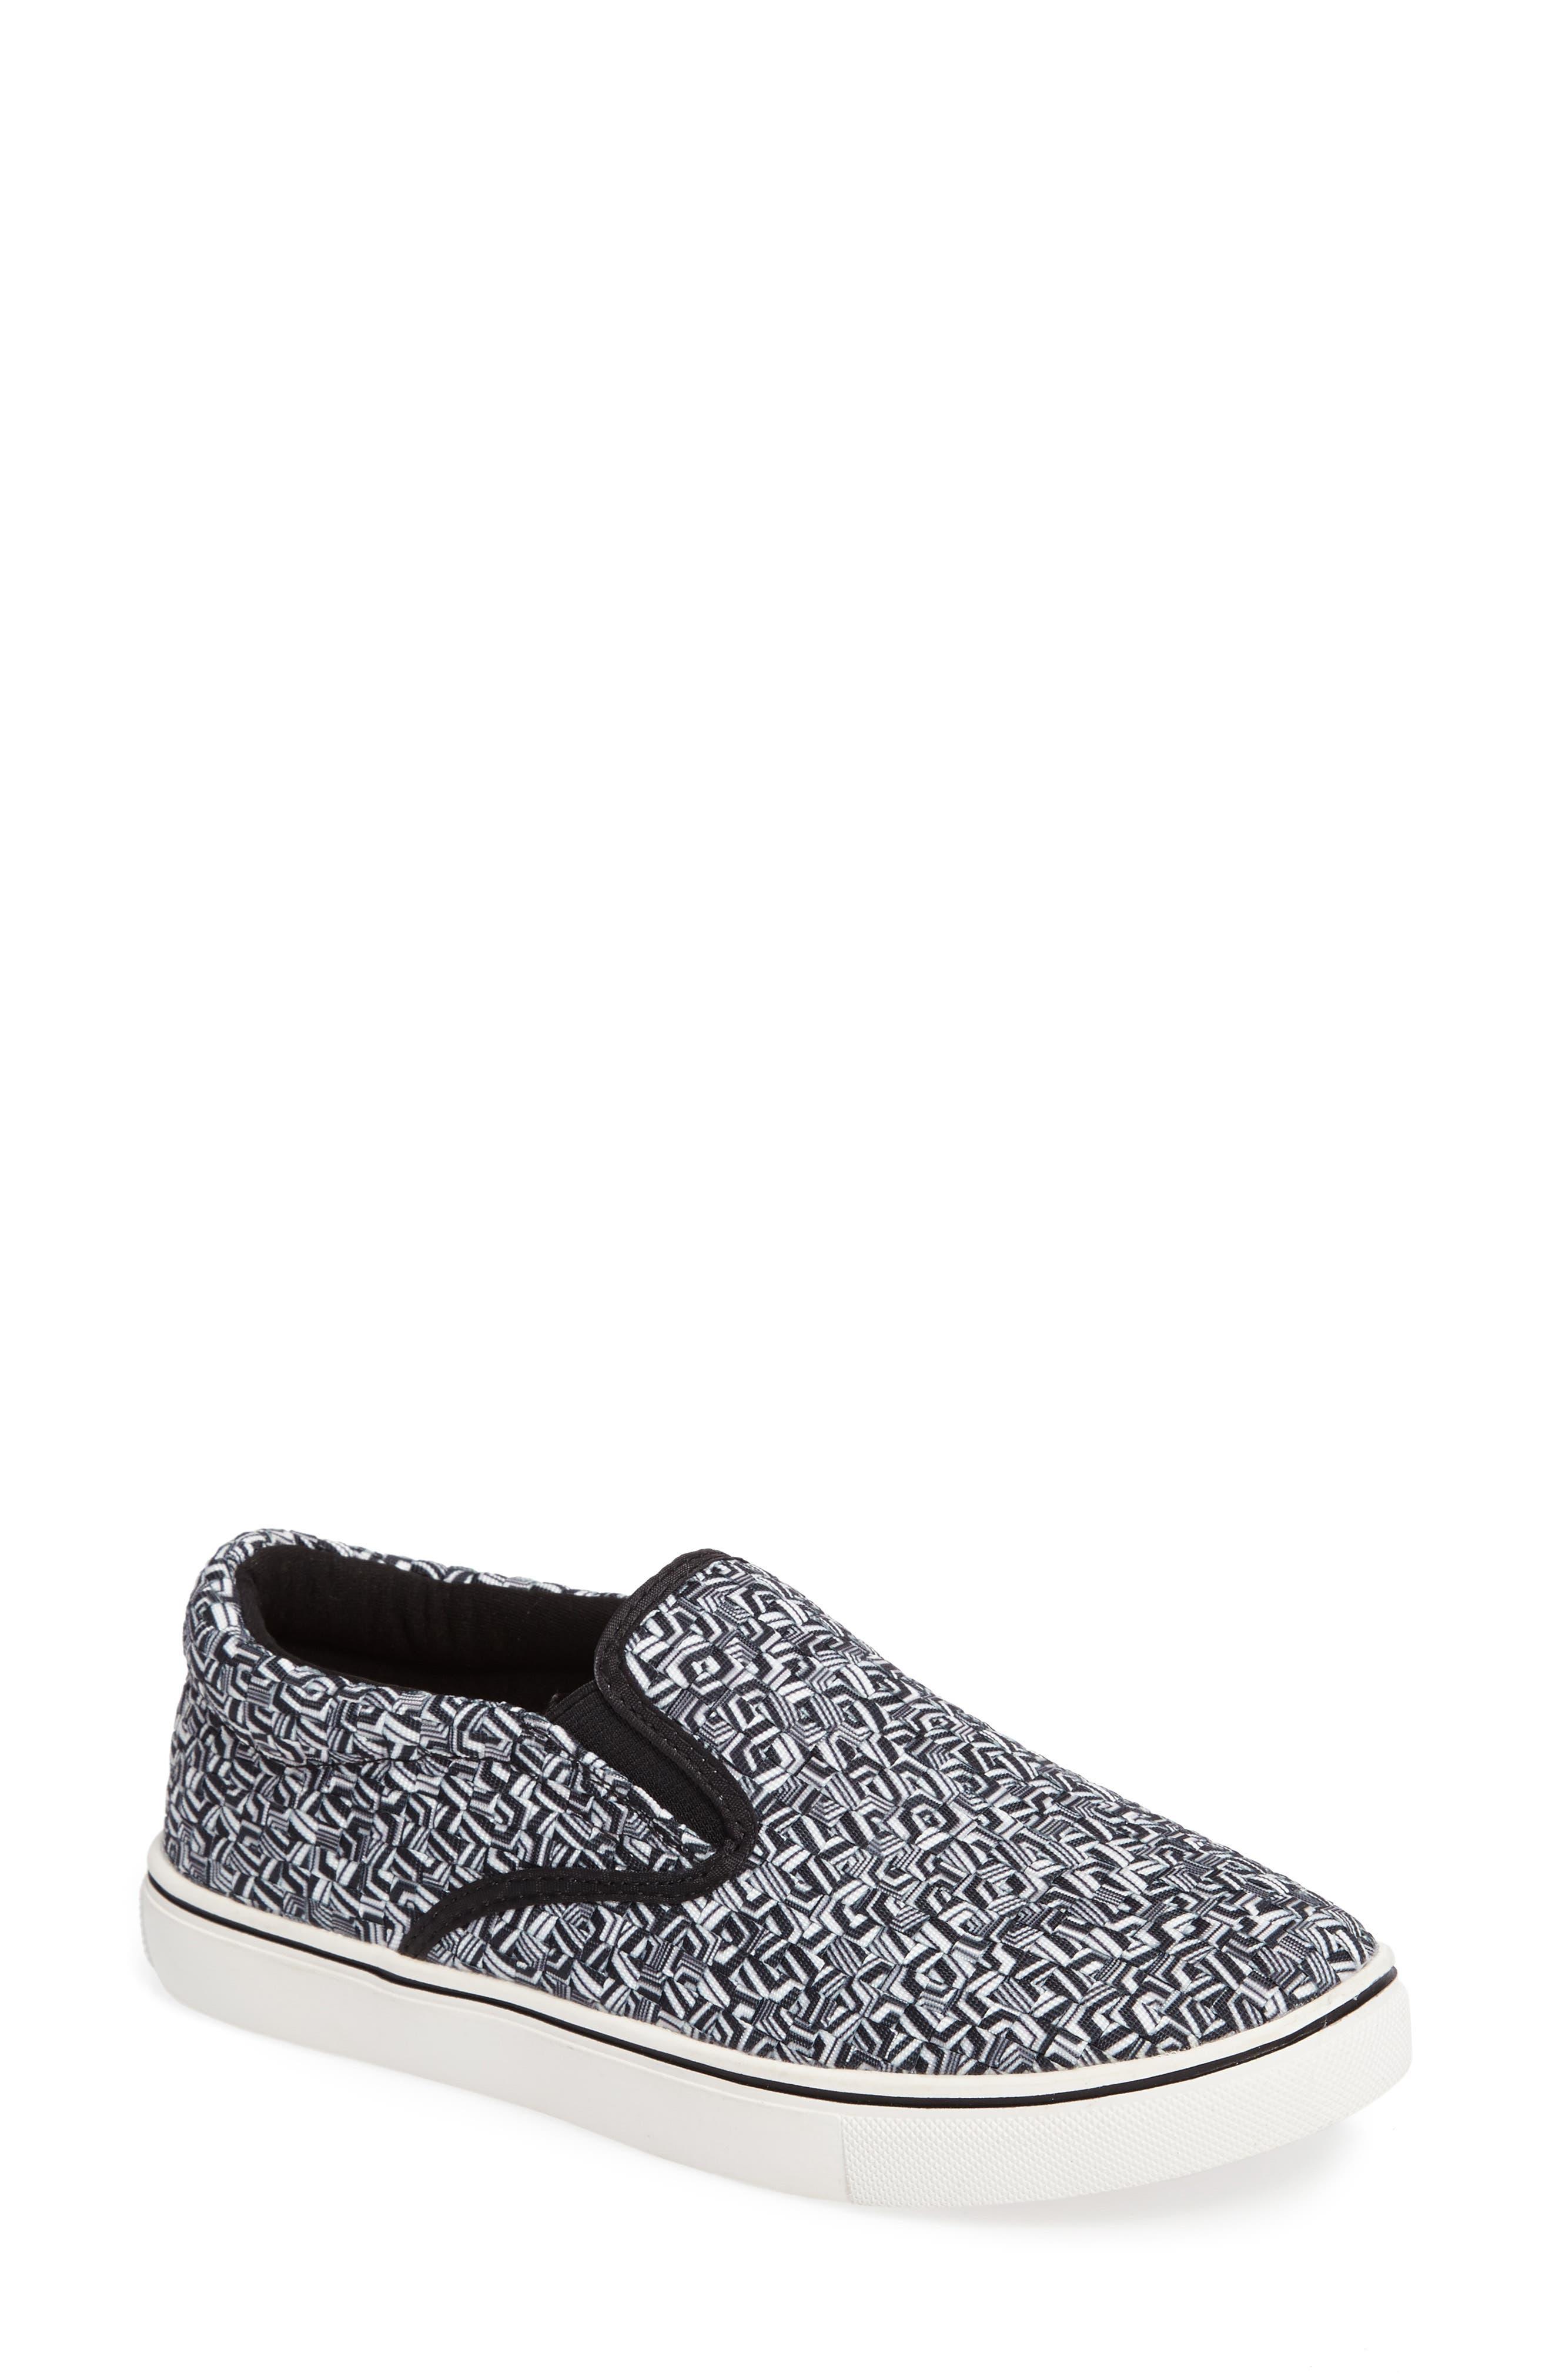 'Verona' Slip-On Sneaker,                             Main thumbnail 1, color,                             Marble Fabric